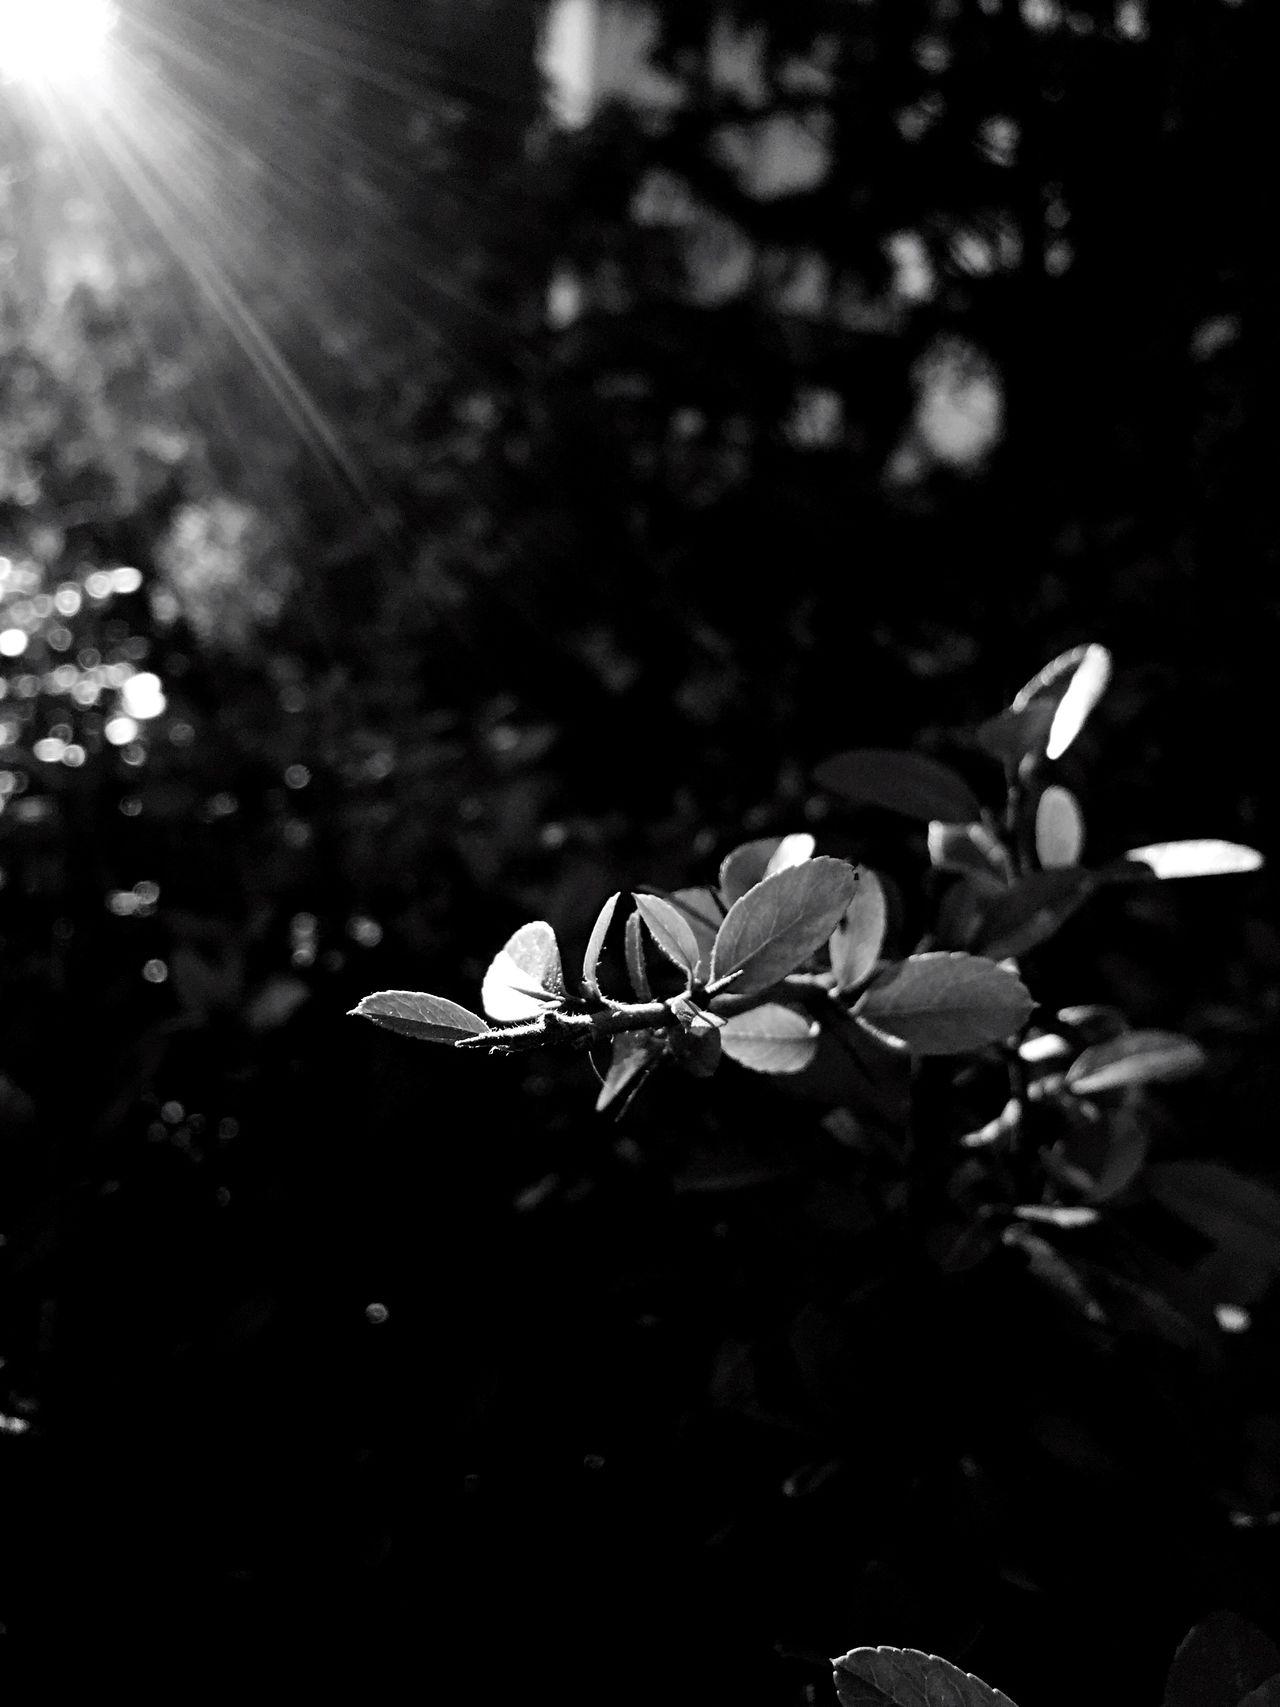 Sophisticated Black And White Black & White Blackandwhite Photography Nature Nature Photography Sun Sunlight EyeEmNewHere Break The Mold EyeEmNewHere The Great Outdoors - 2017 EyeEm Awards